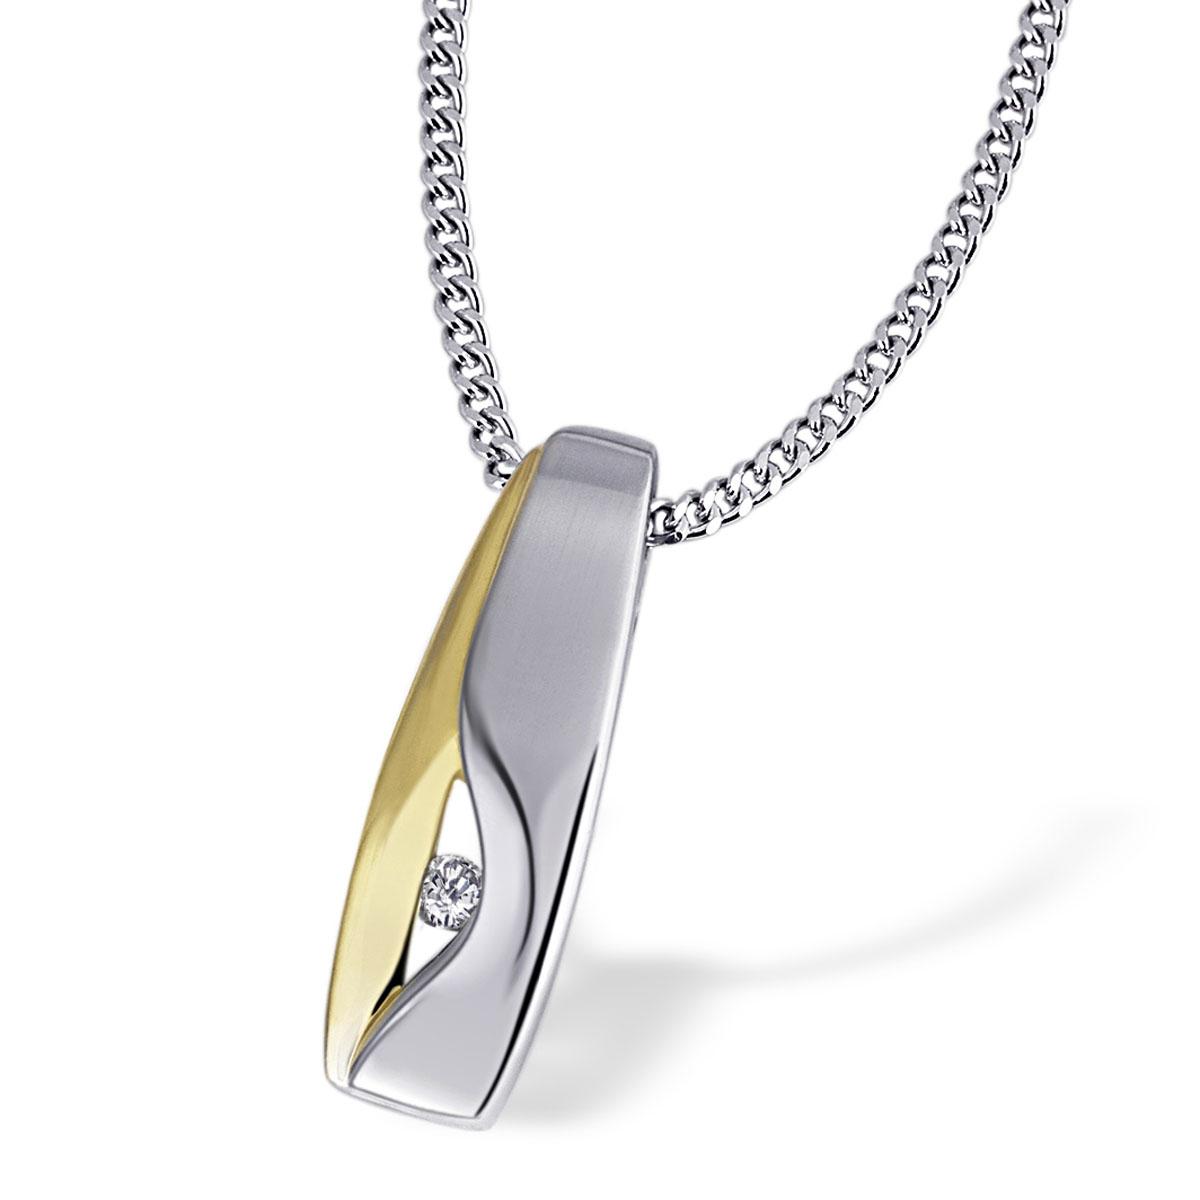 Goldmaid-Damenring-Kette-oder-Creolen-925er-Sterlingsilber-vergoldet-Brillanten